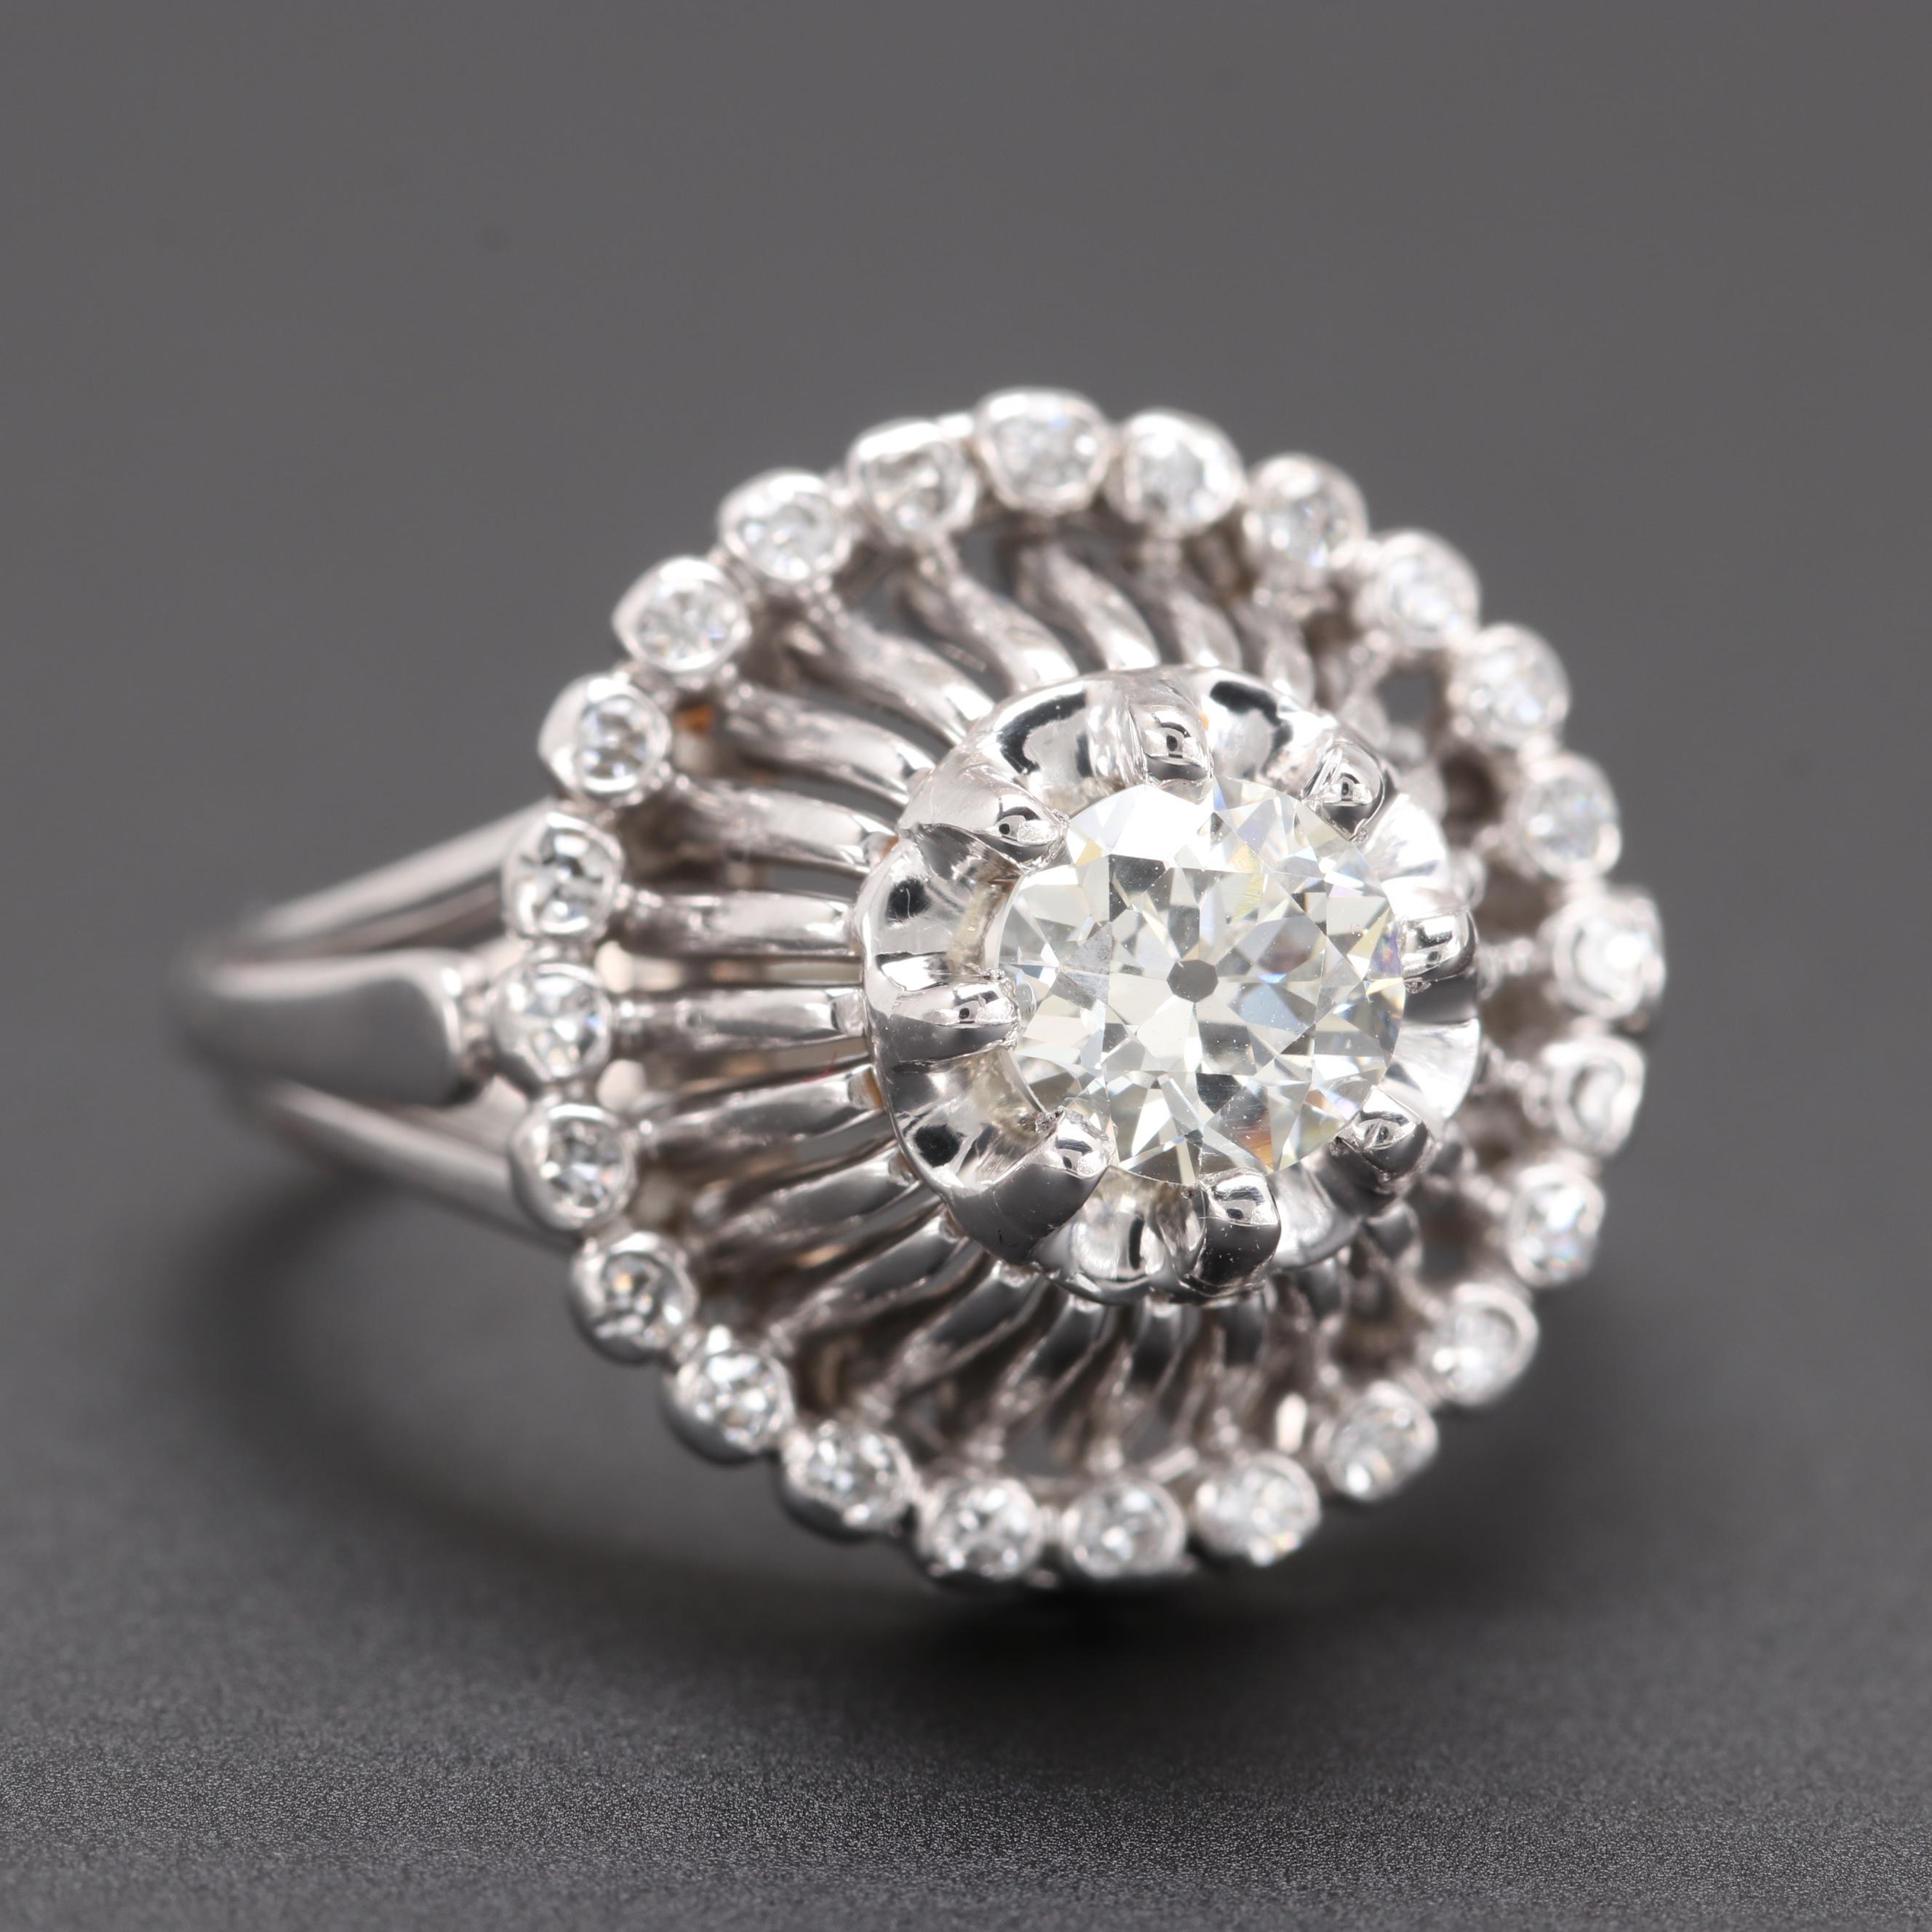 18K White Gold Diamond Halo Ring with GIA Report